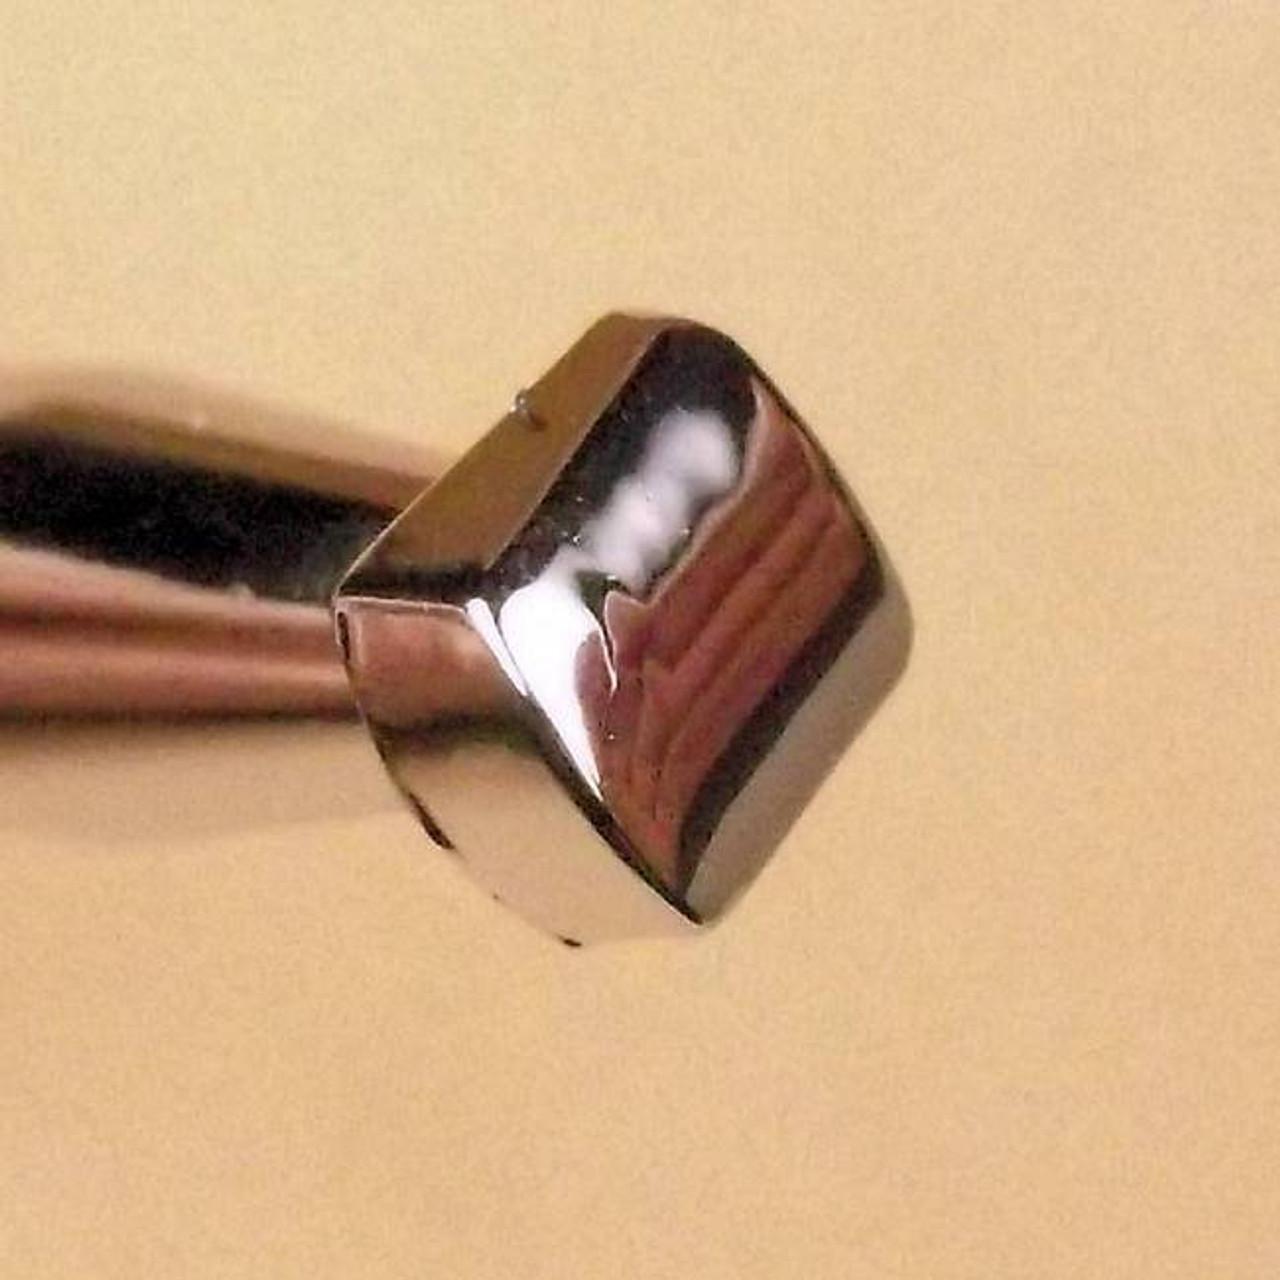 "Beveler Smooth Leather Stamp 3/16"" x 1/4""(4.7 mm x 6.4 mm) B203"